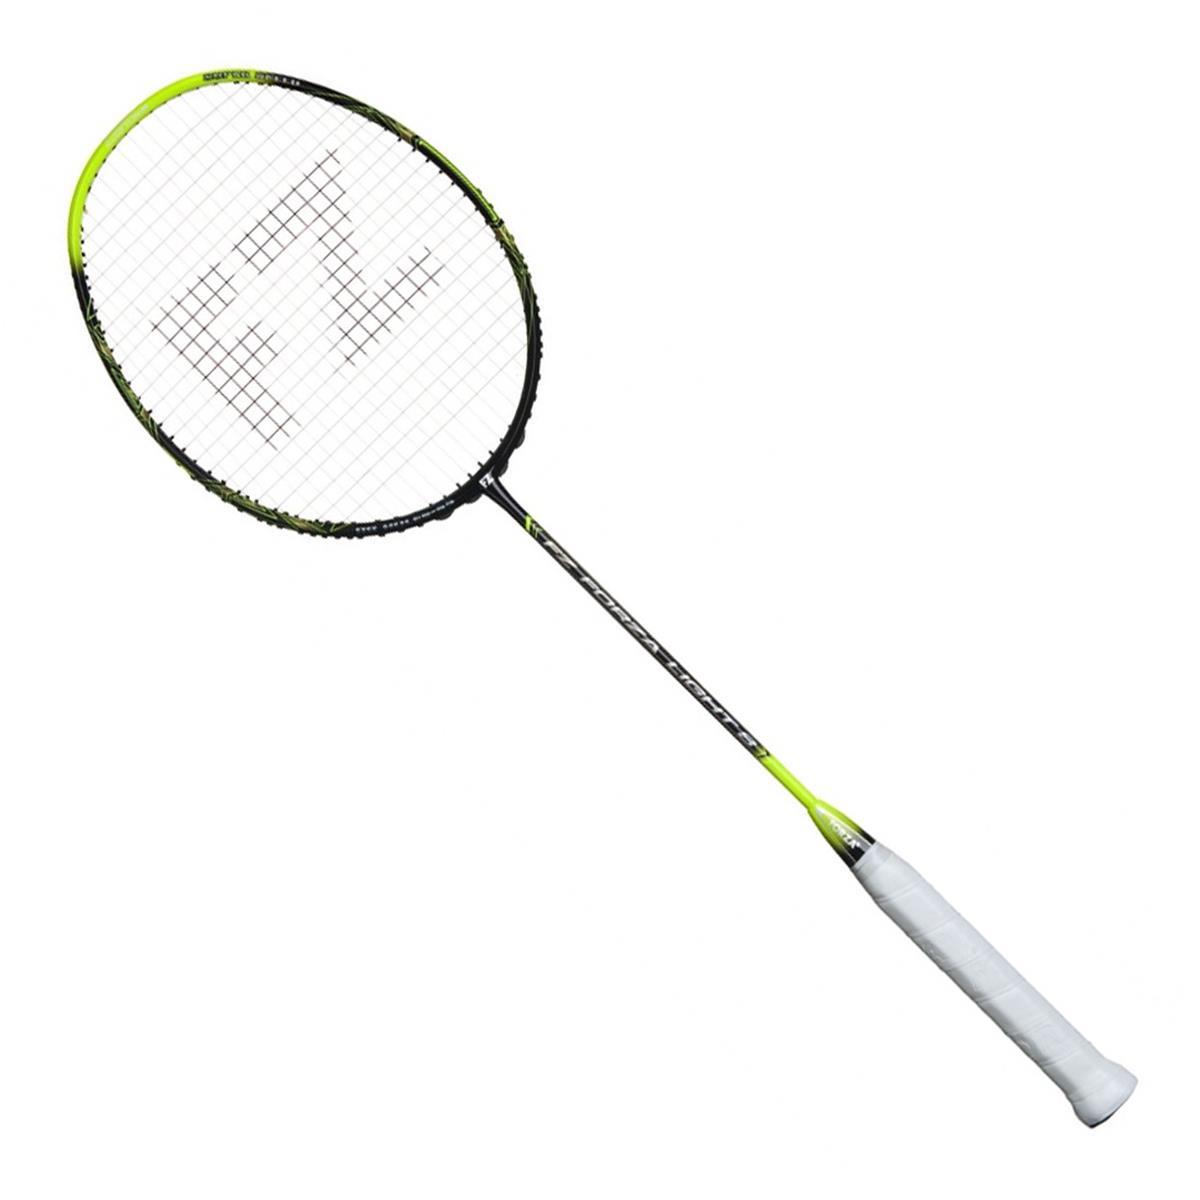 Forza Light 8 Badminton Racket | Direct Badminton